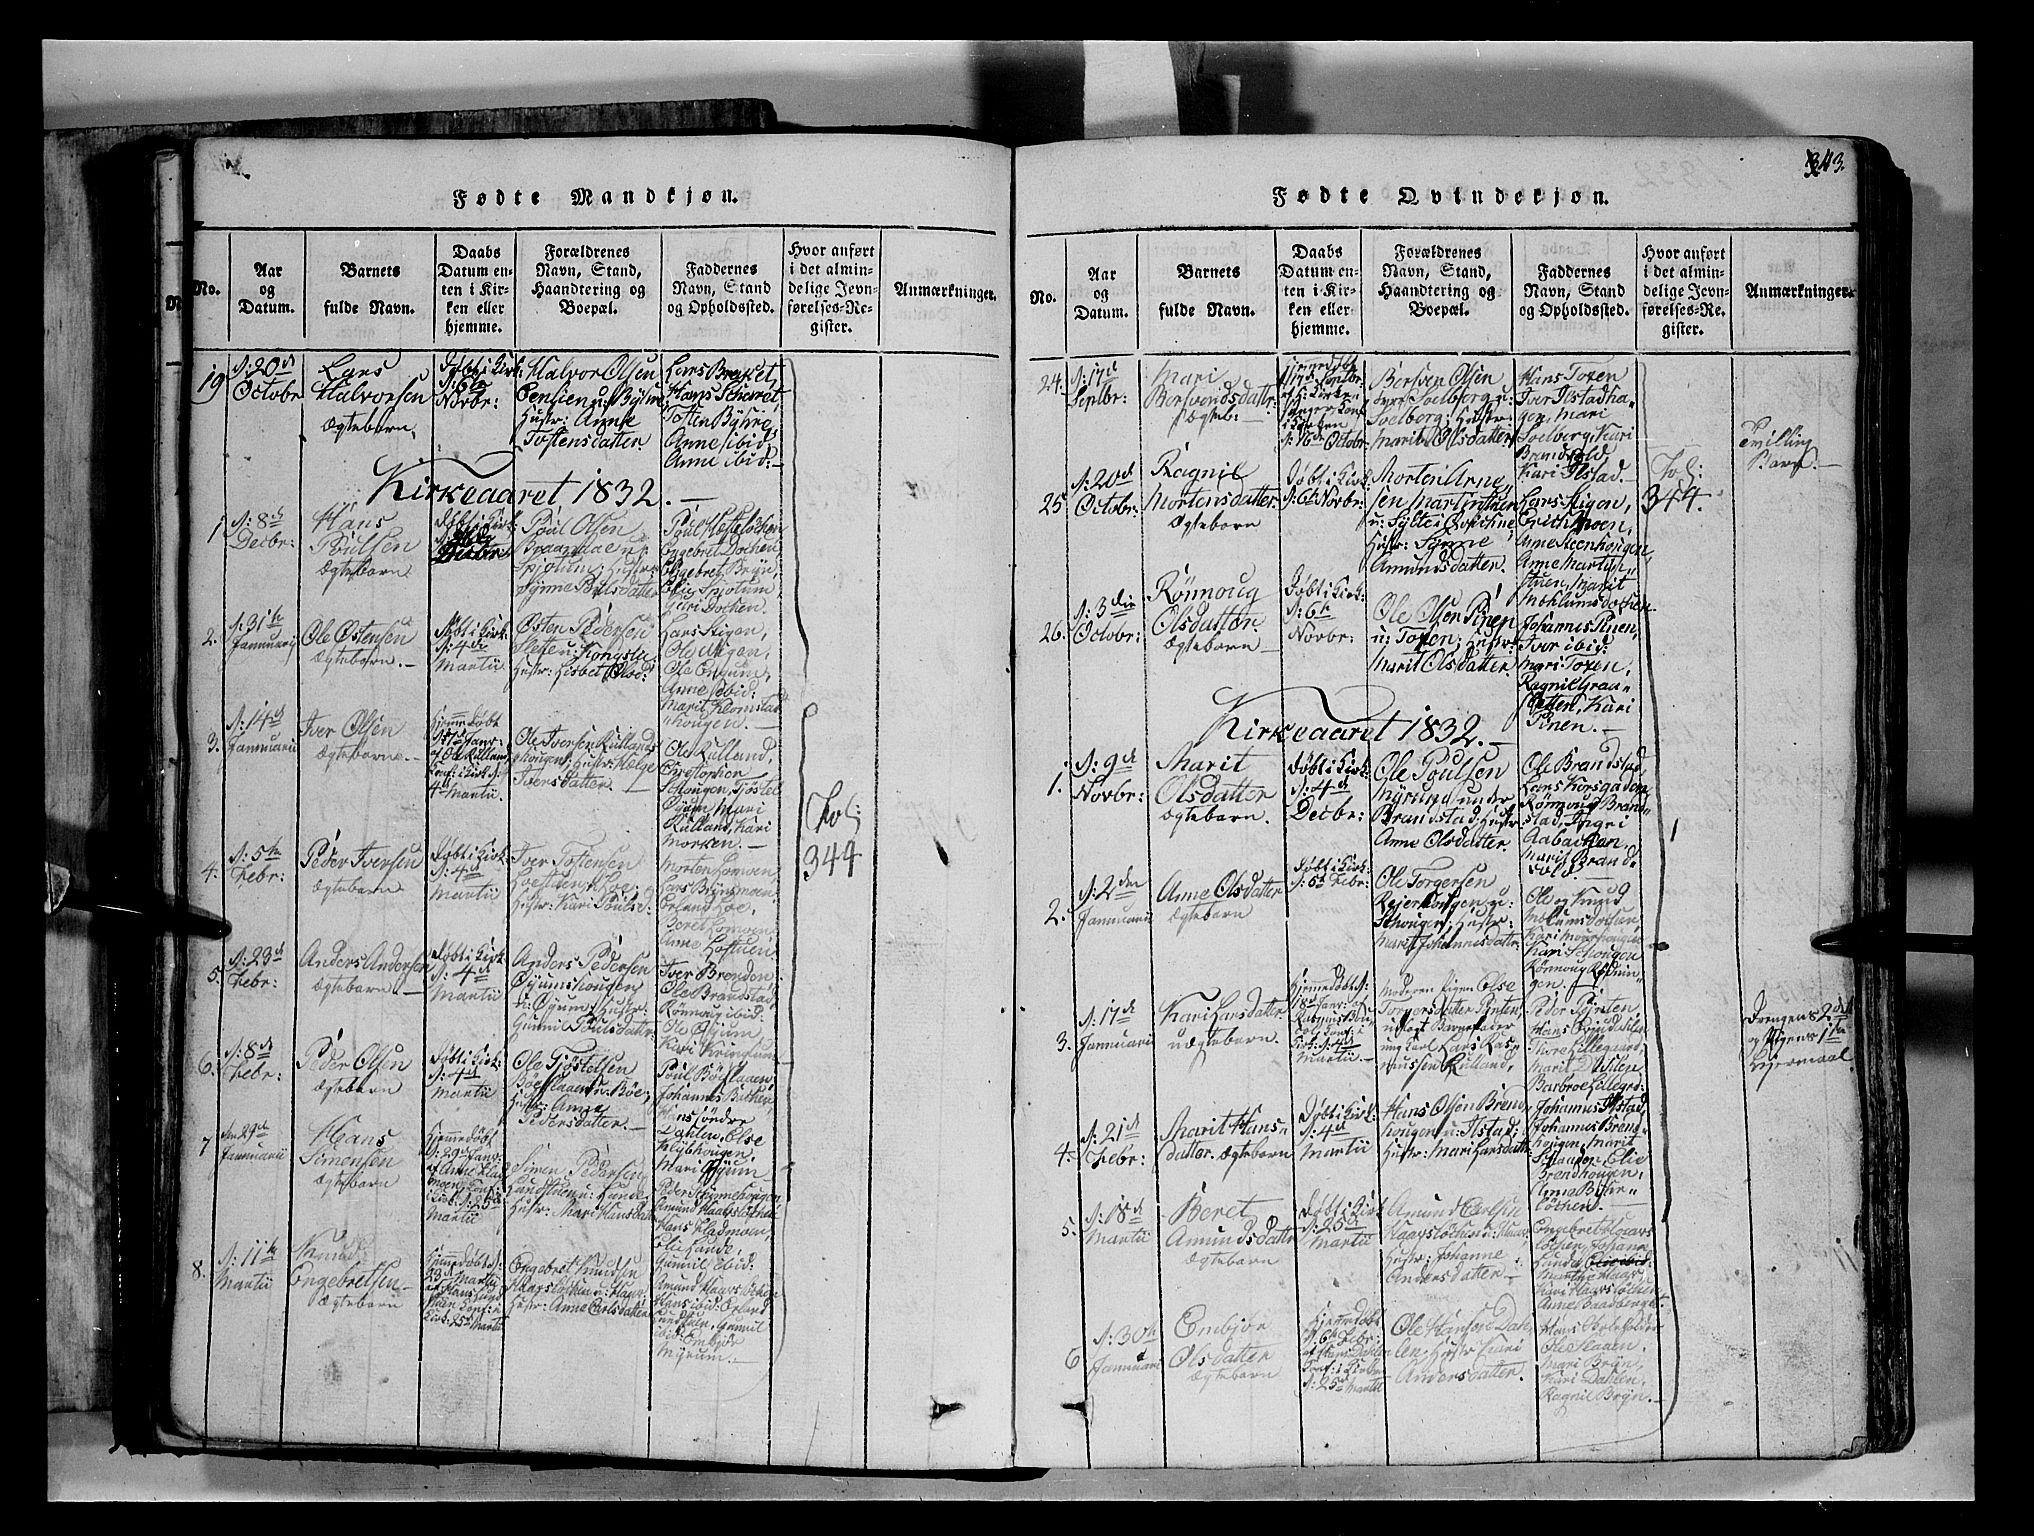 SAH, Fron prestekontor, H/Ha/Hab/L0004: Klokkerbok nr. 4, 1816-1850, s. 43